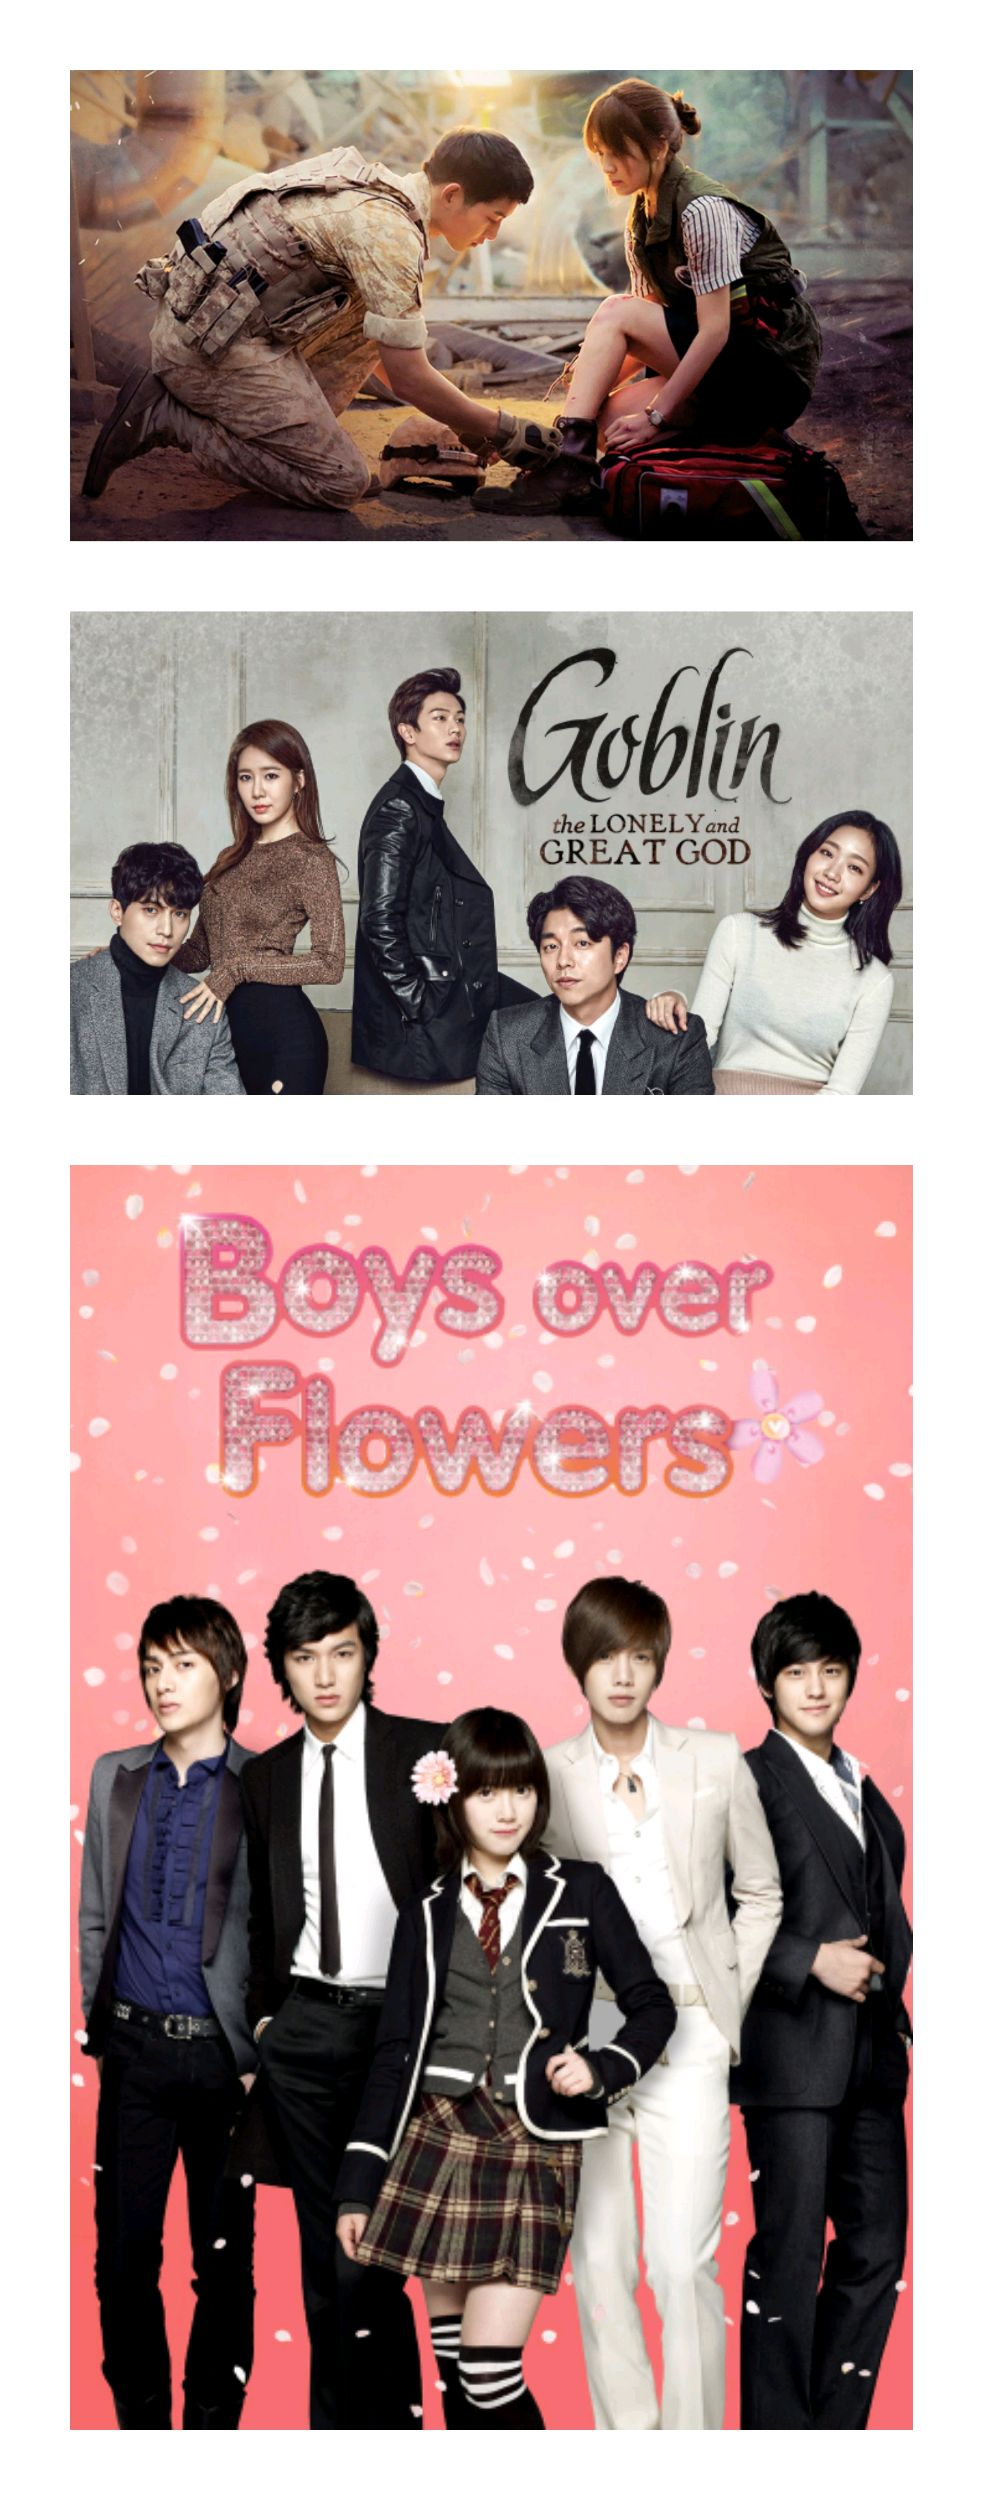 #descentsofthesun #goblin #boysoverflowers